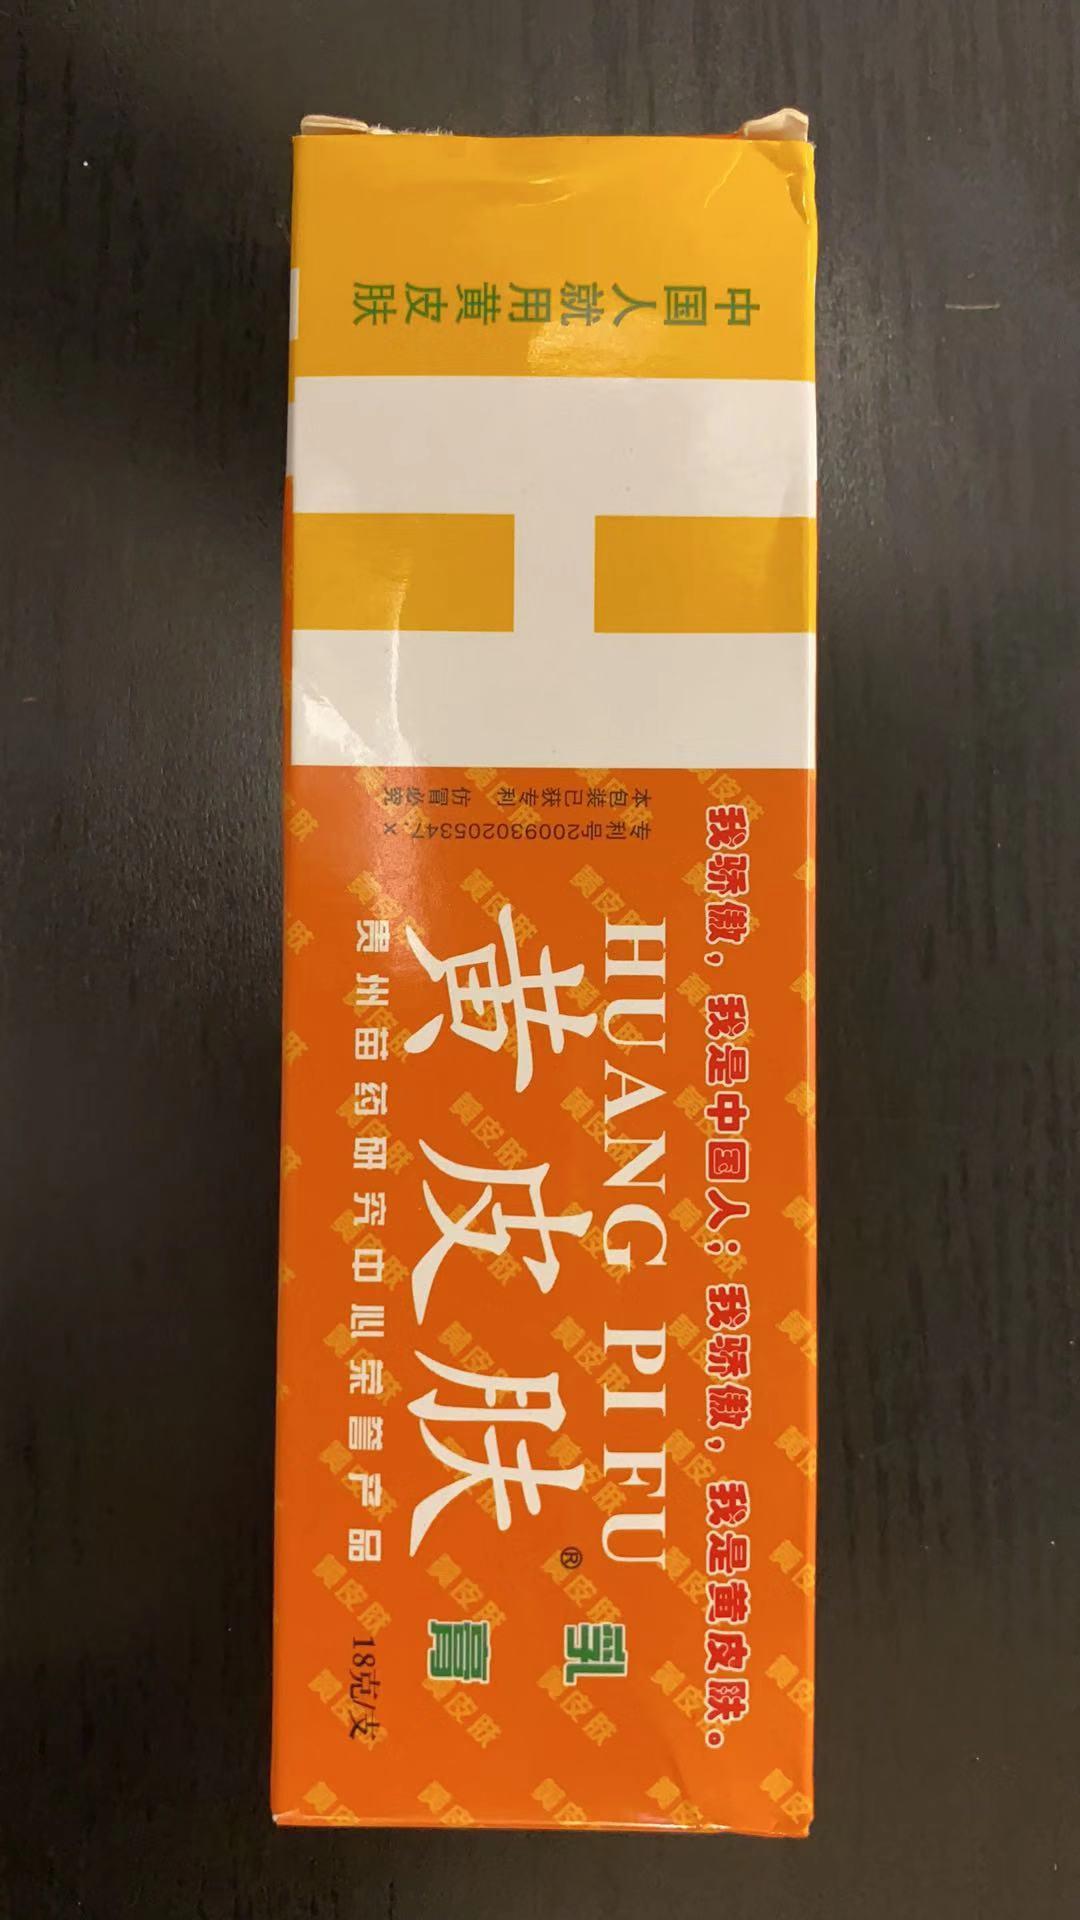 huang pifu kenőcs pikkelysömörhöz